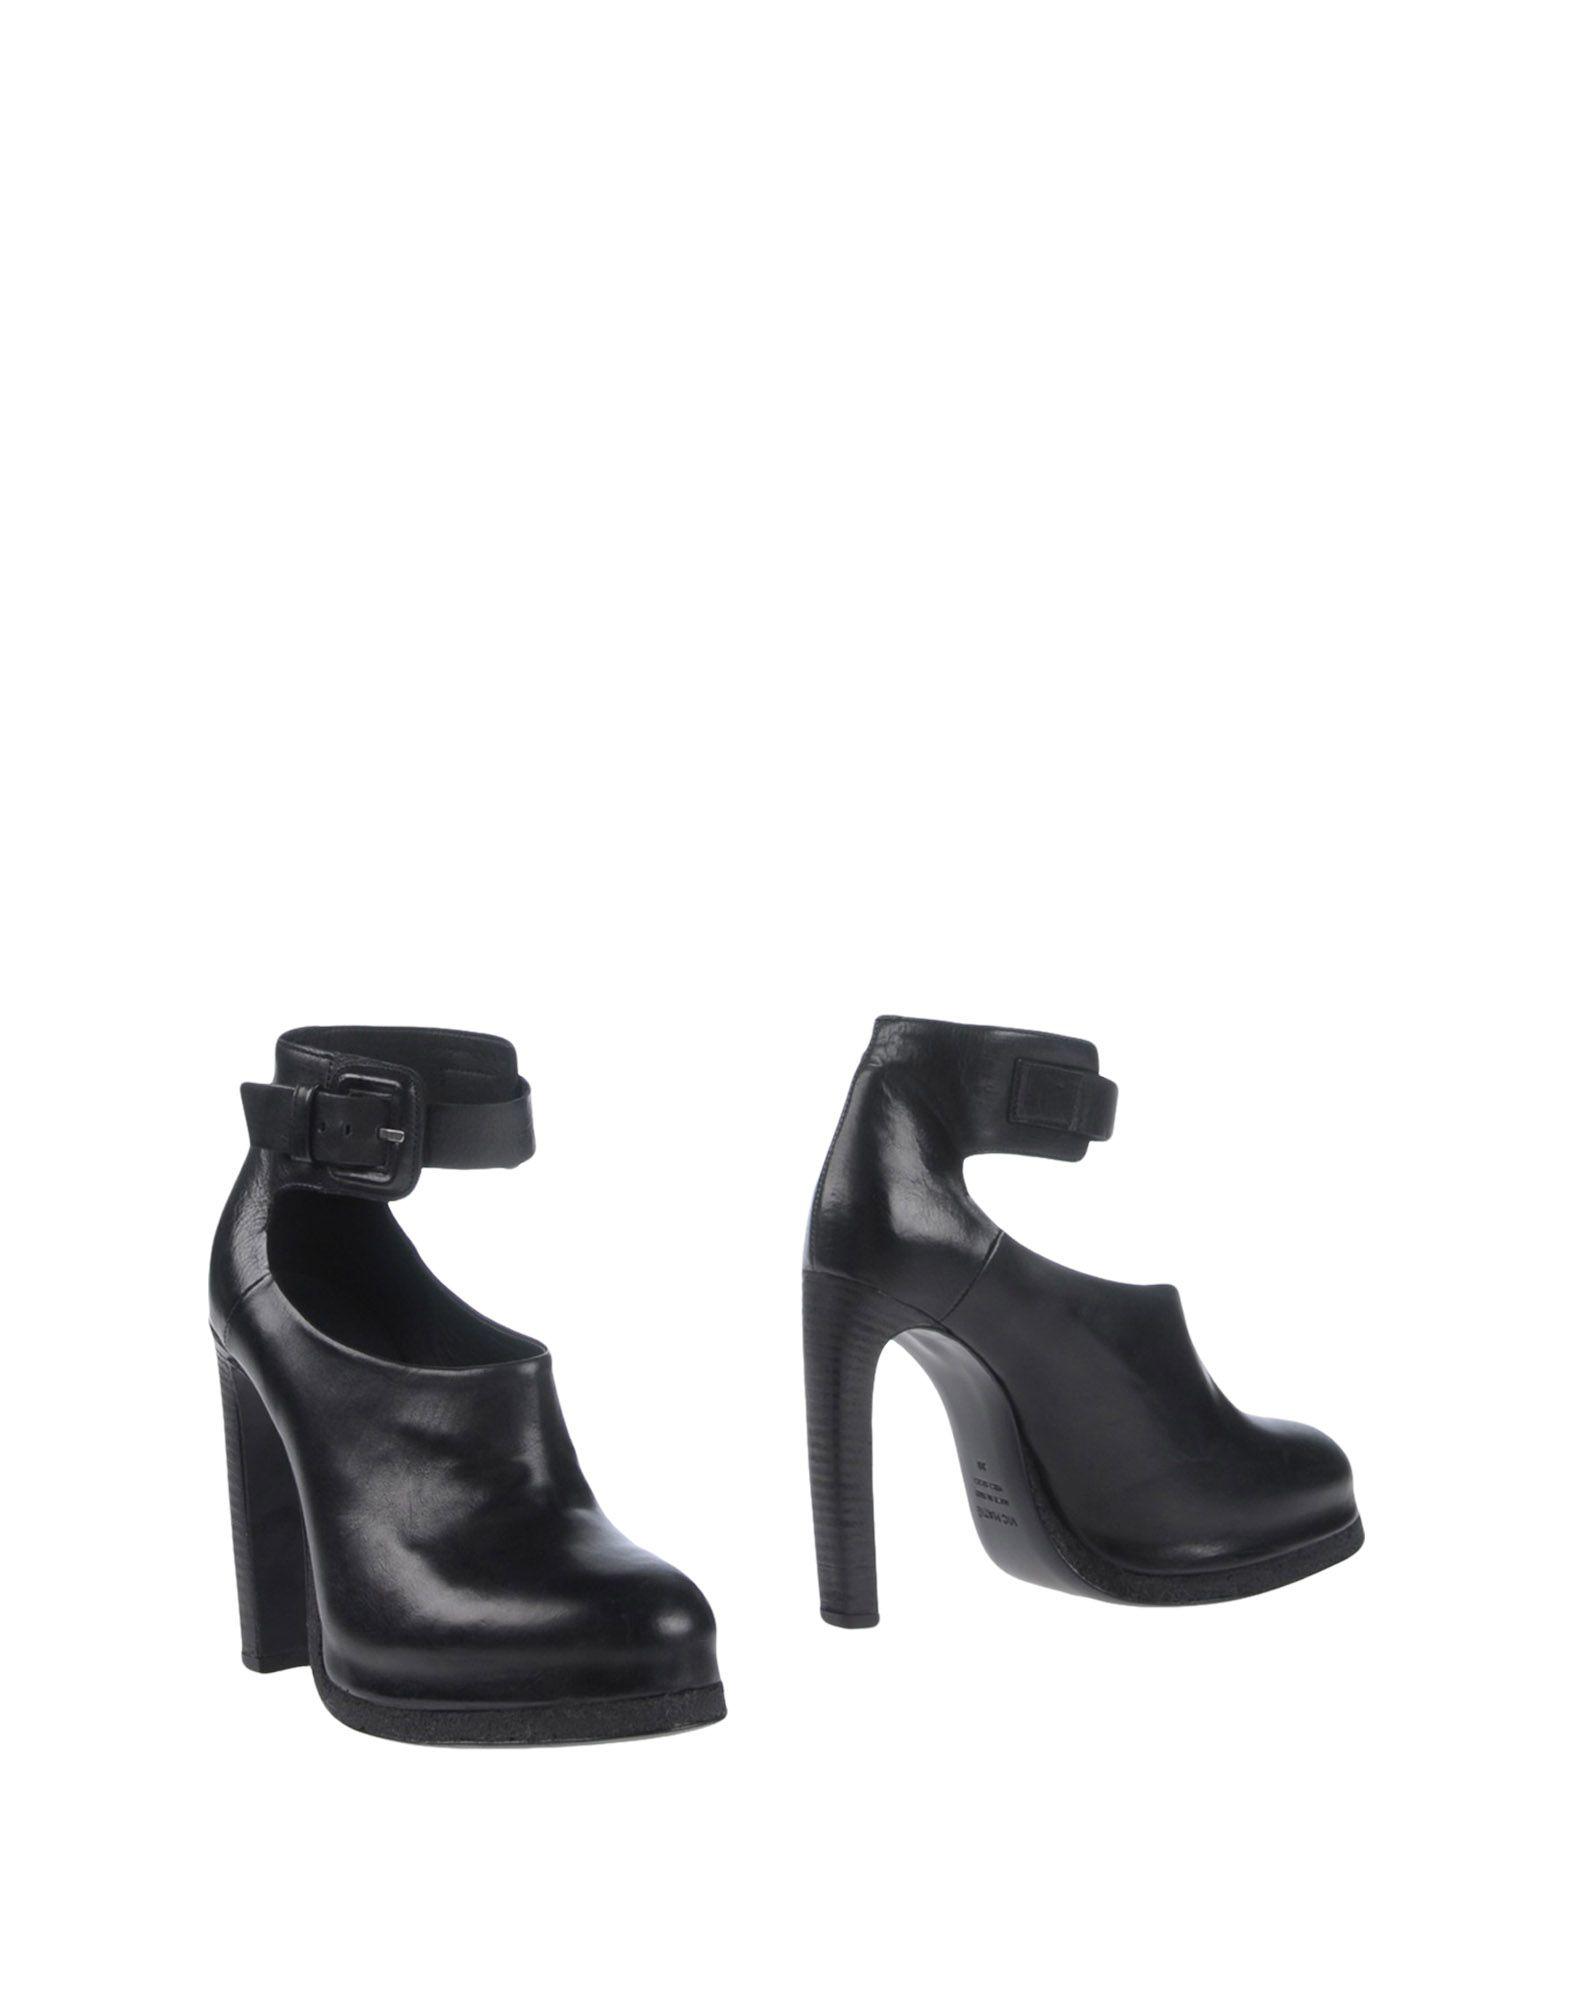 Rabatt Schuhe Stiefelette Vic Matiē Stiefelette Schuhe Damen  11017728PF 8edfbb